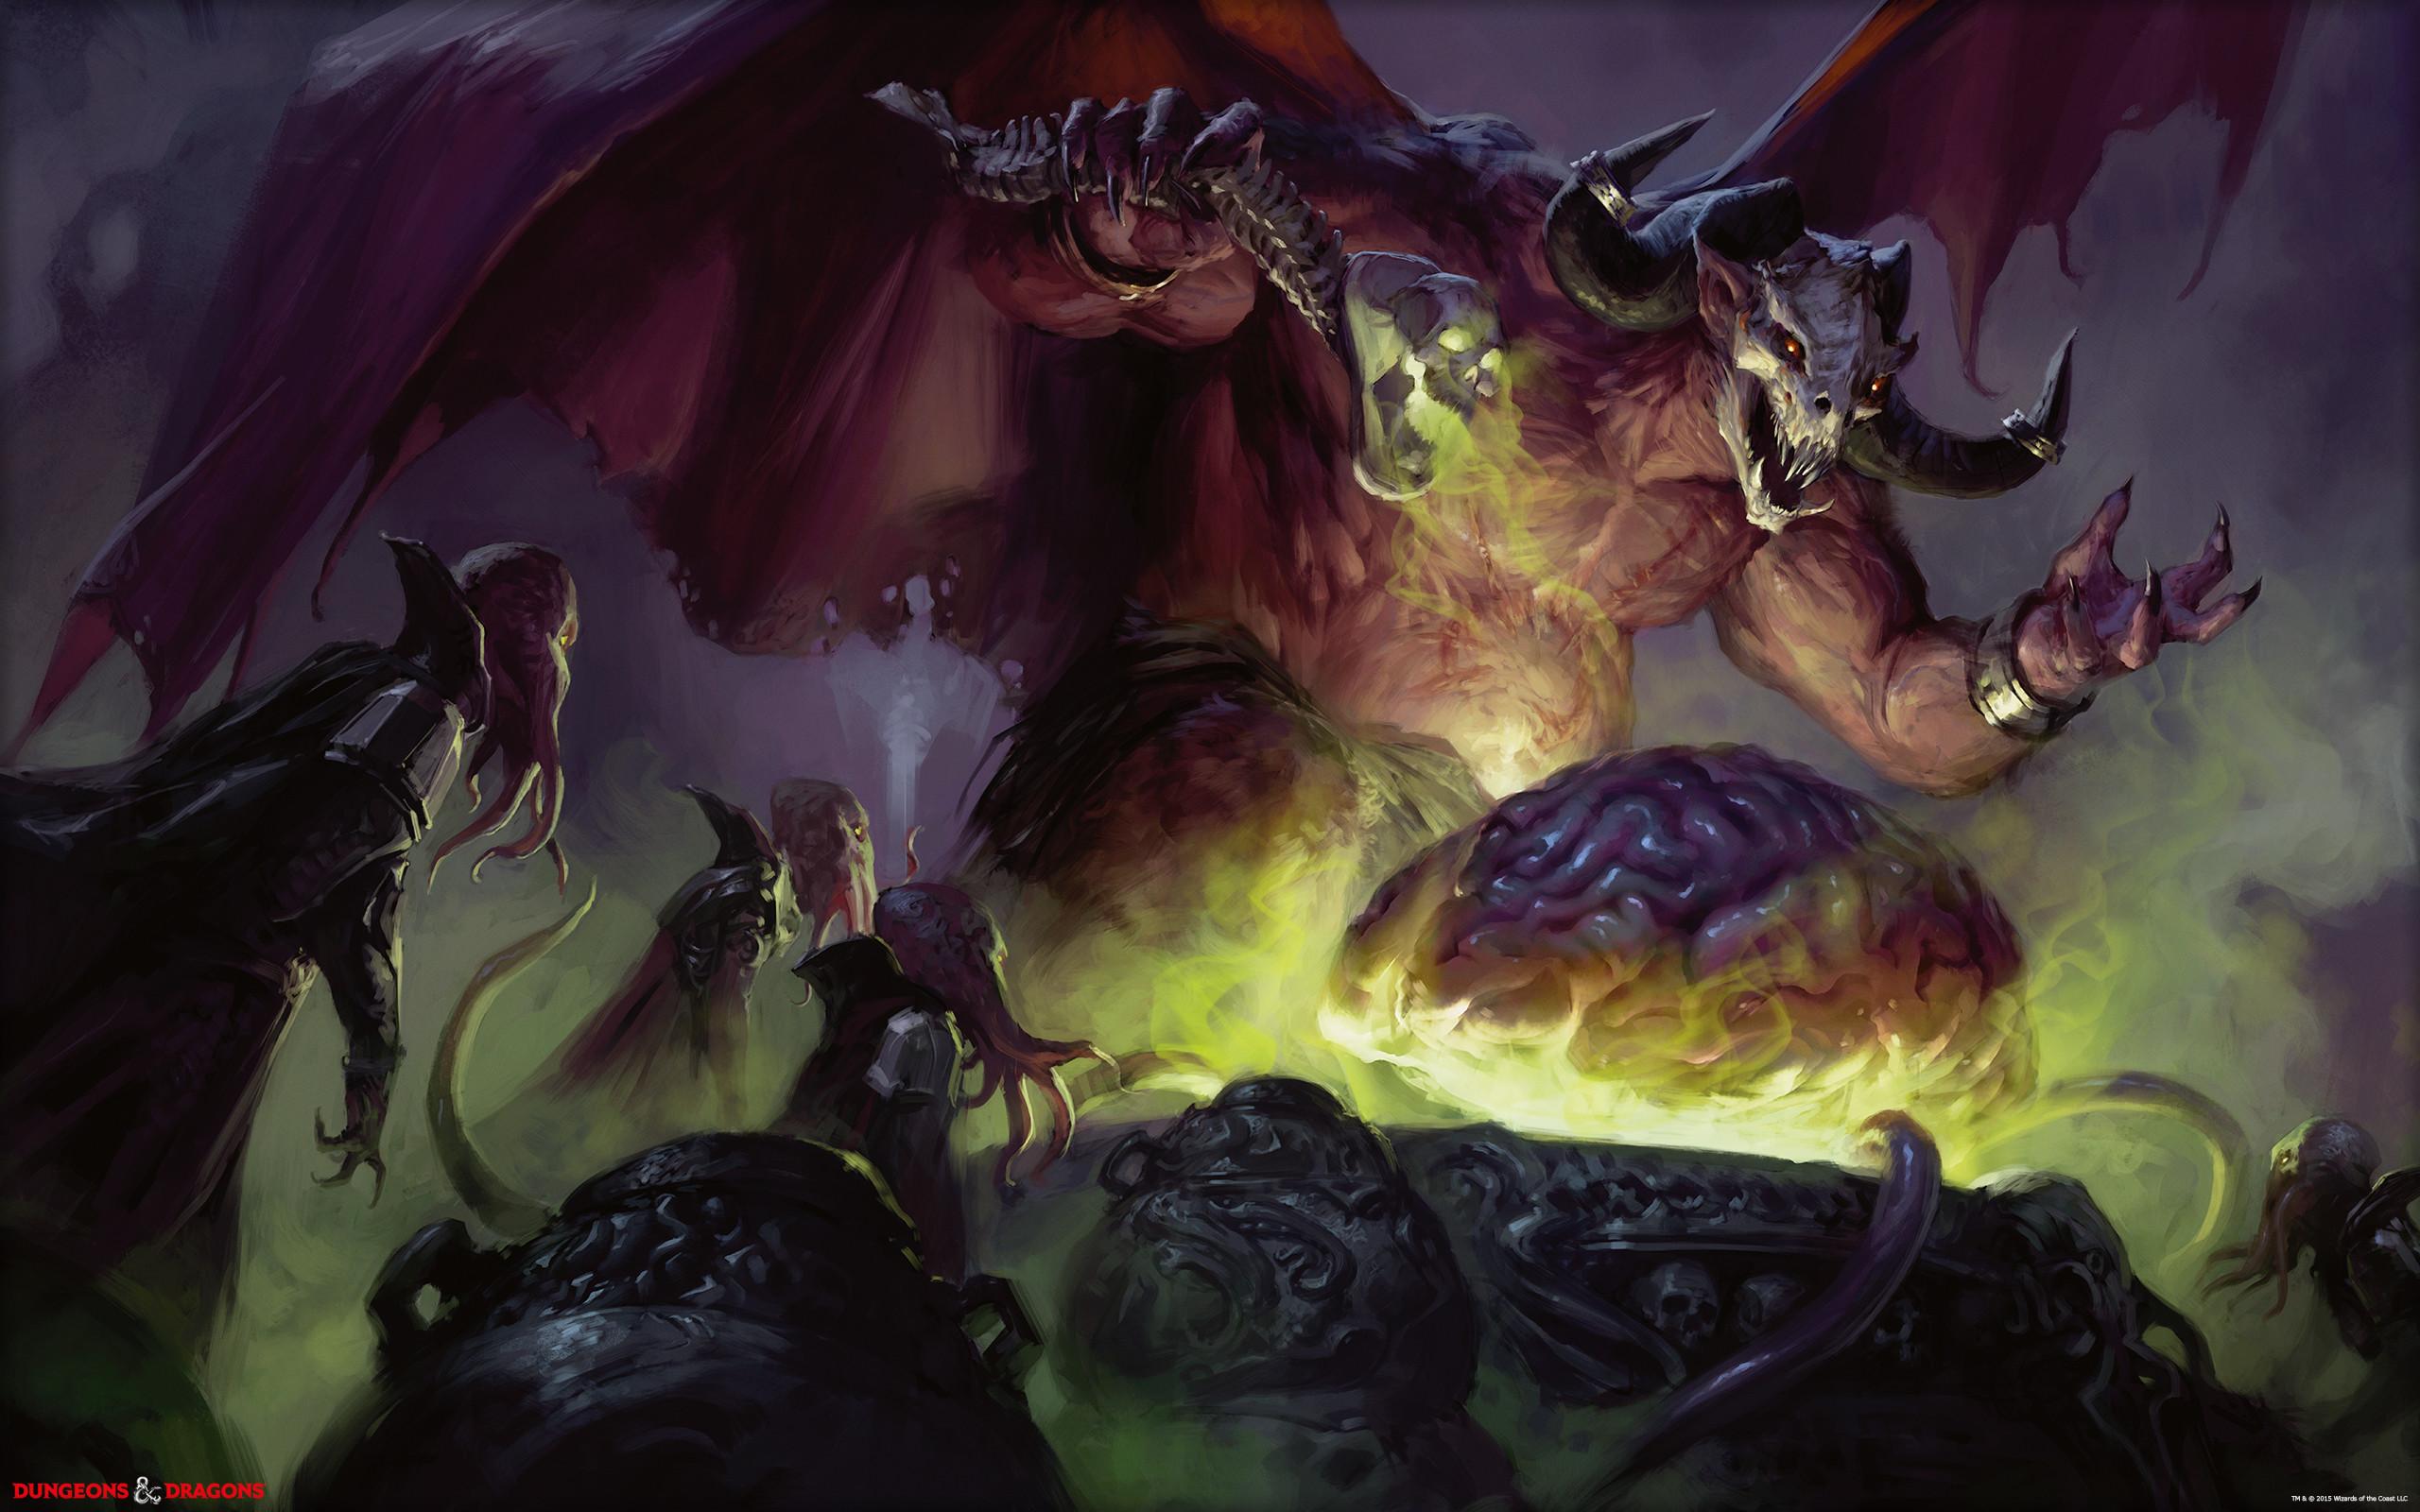 https://dnd.wizards.com/sites/default/files/media/ROD_Orcus_2560x1600_Wallpaper.jpg  | Demons and Devils | Pinterest